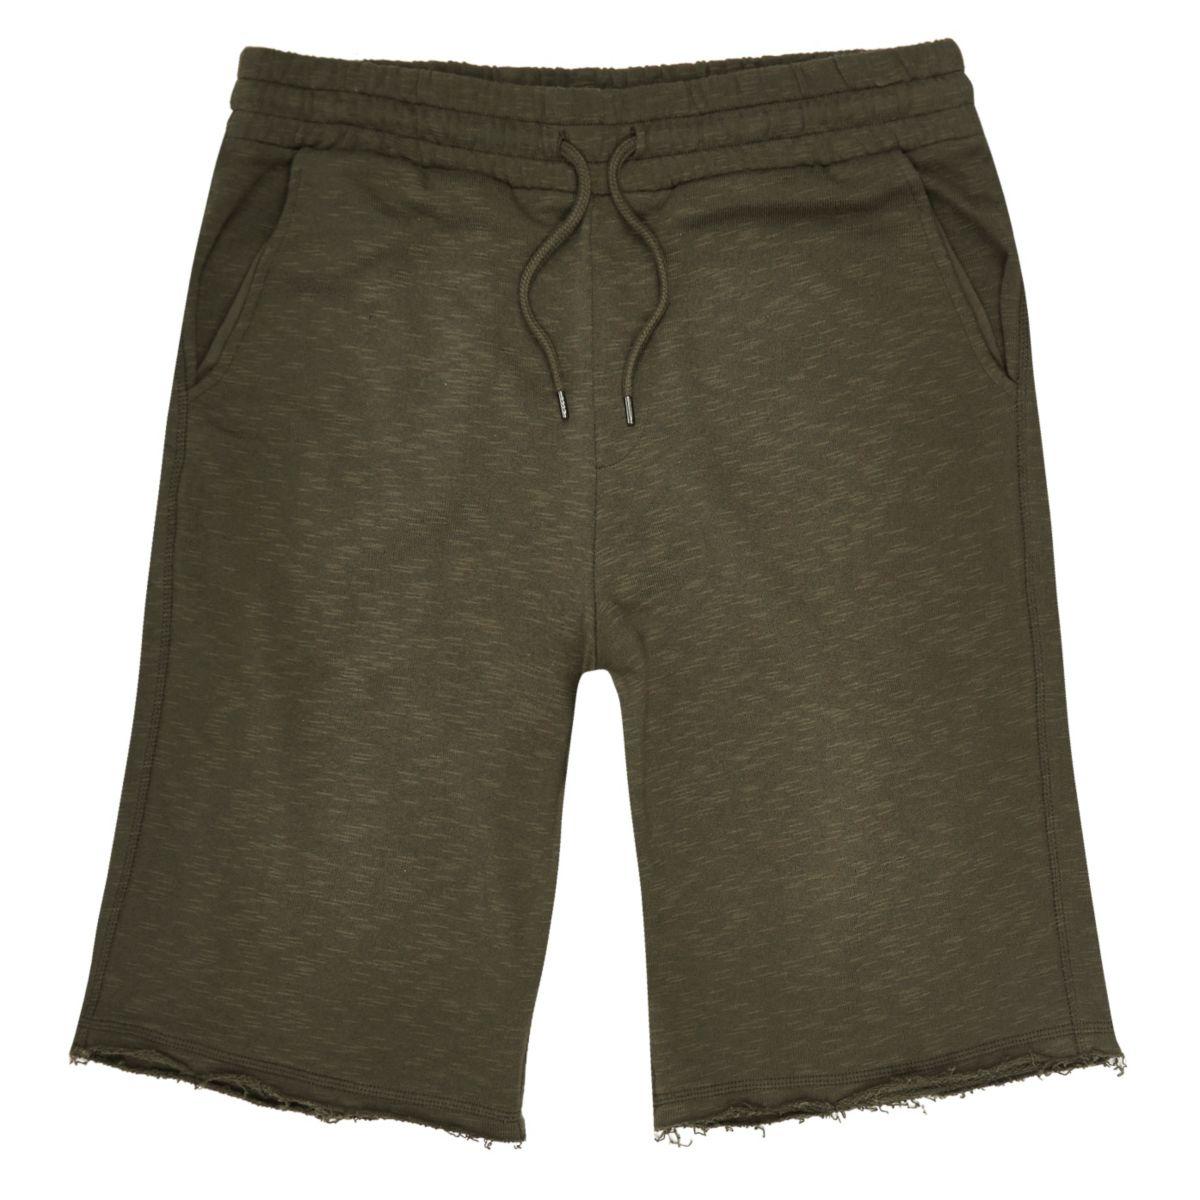 Short en coton flammé vert foncé